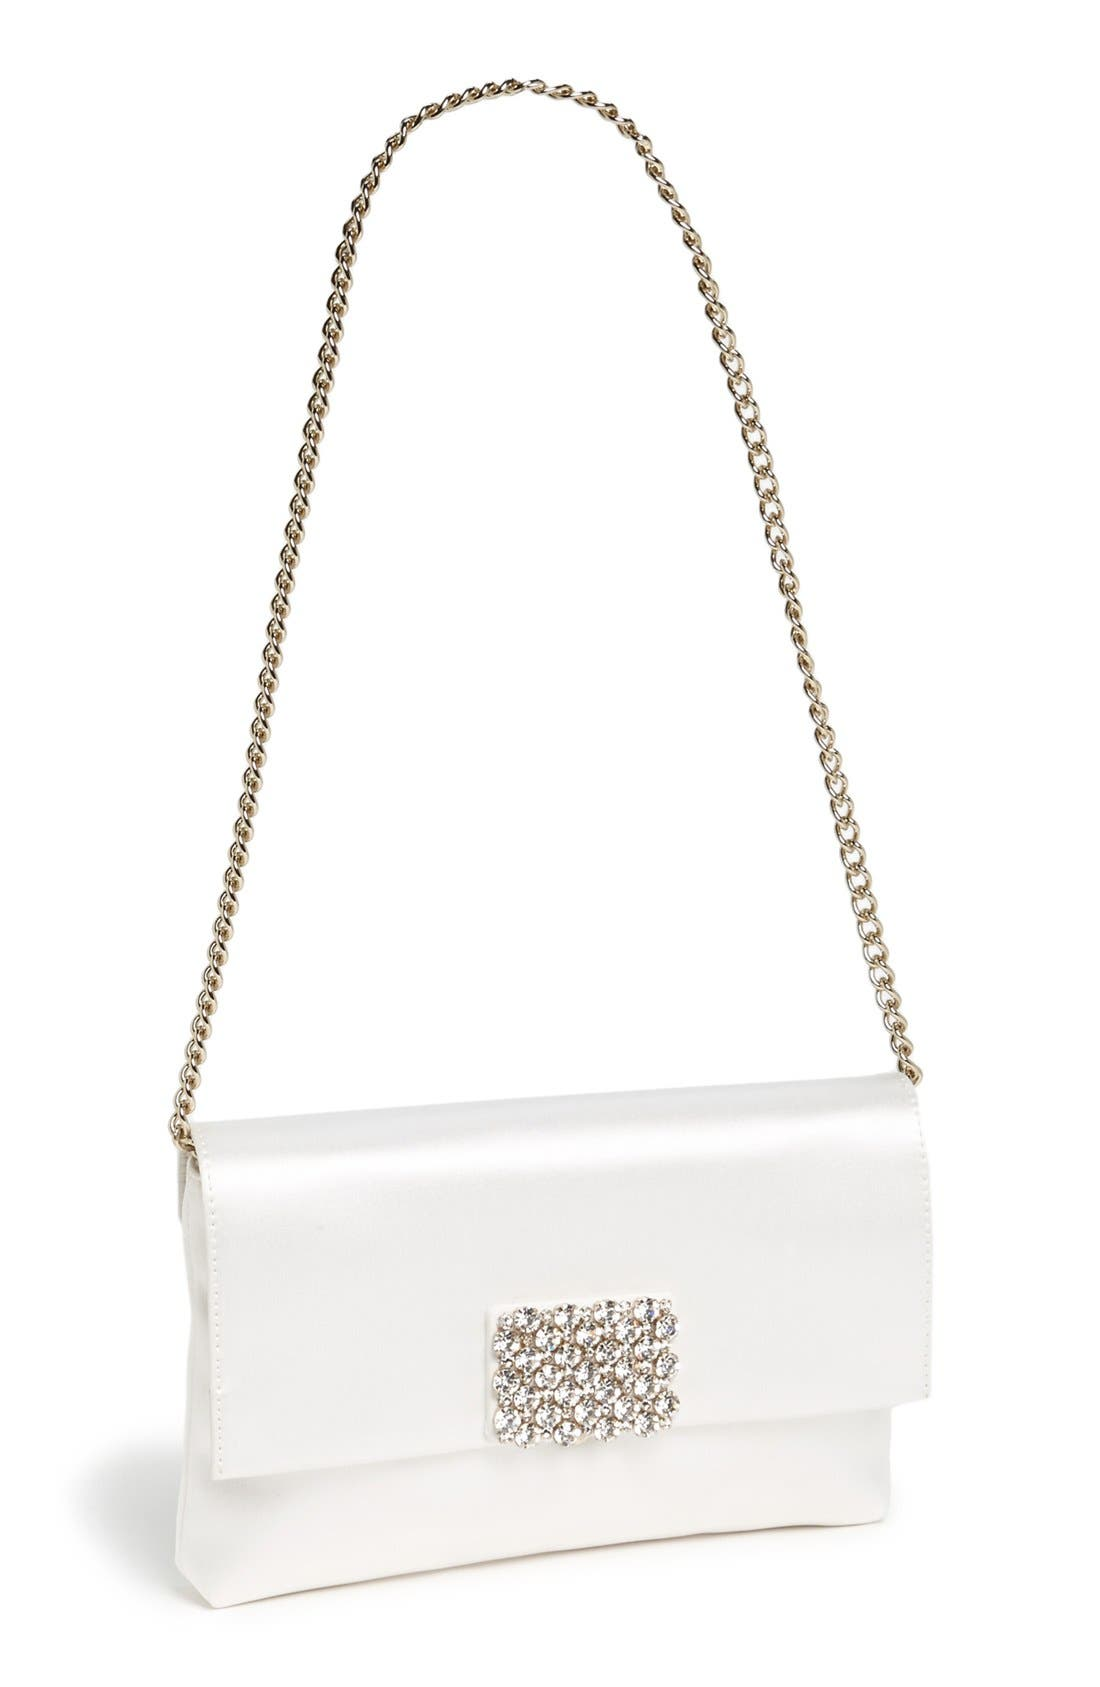 Main Image - kate spade new york 'alouette - wedding belles' handbag